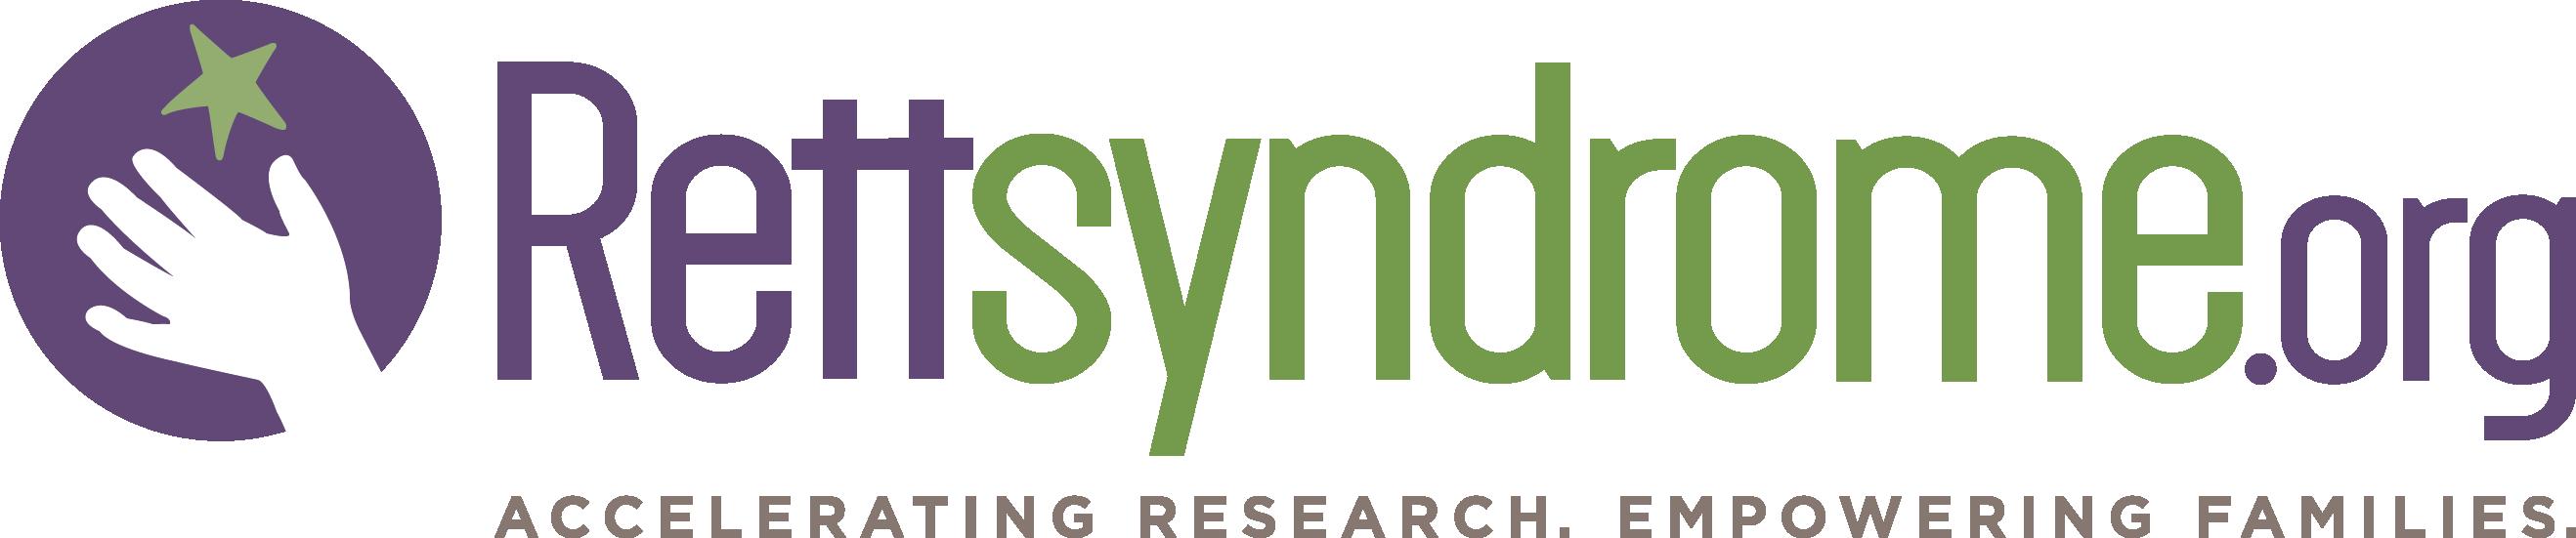 rettsyndromeorg Logo